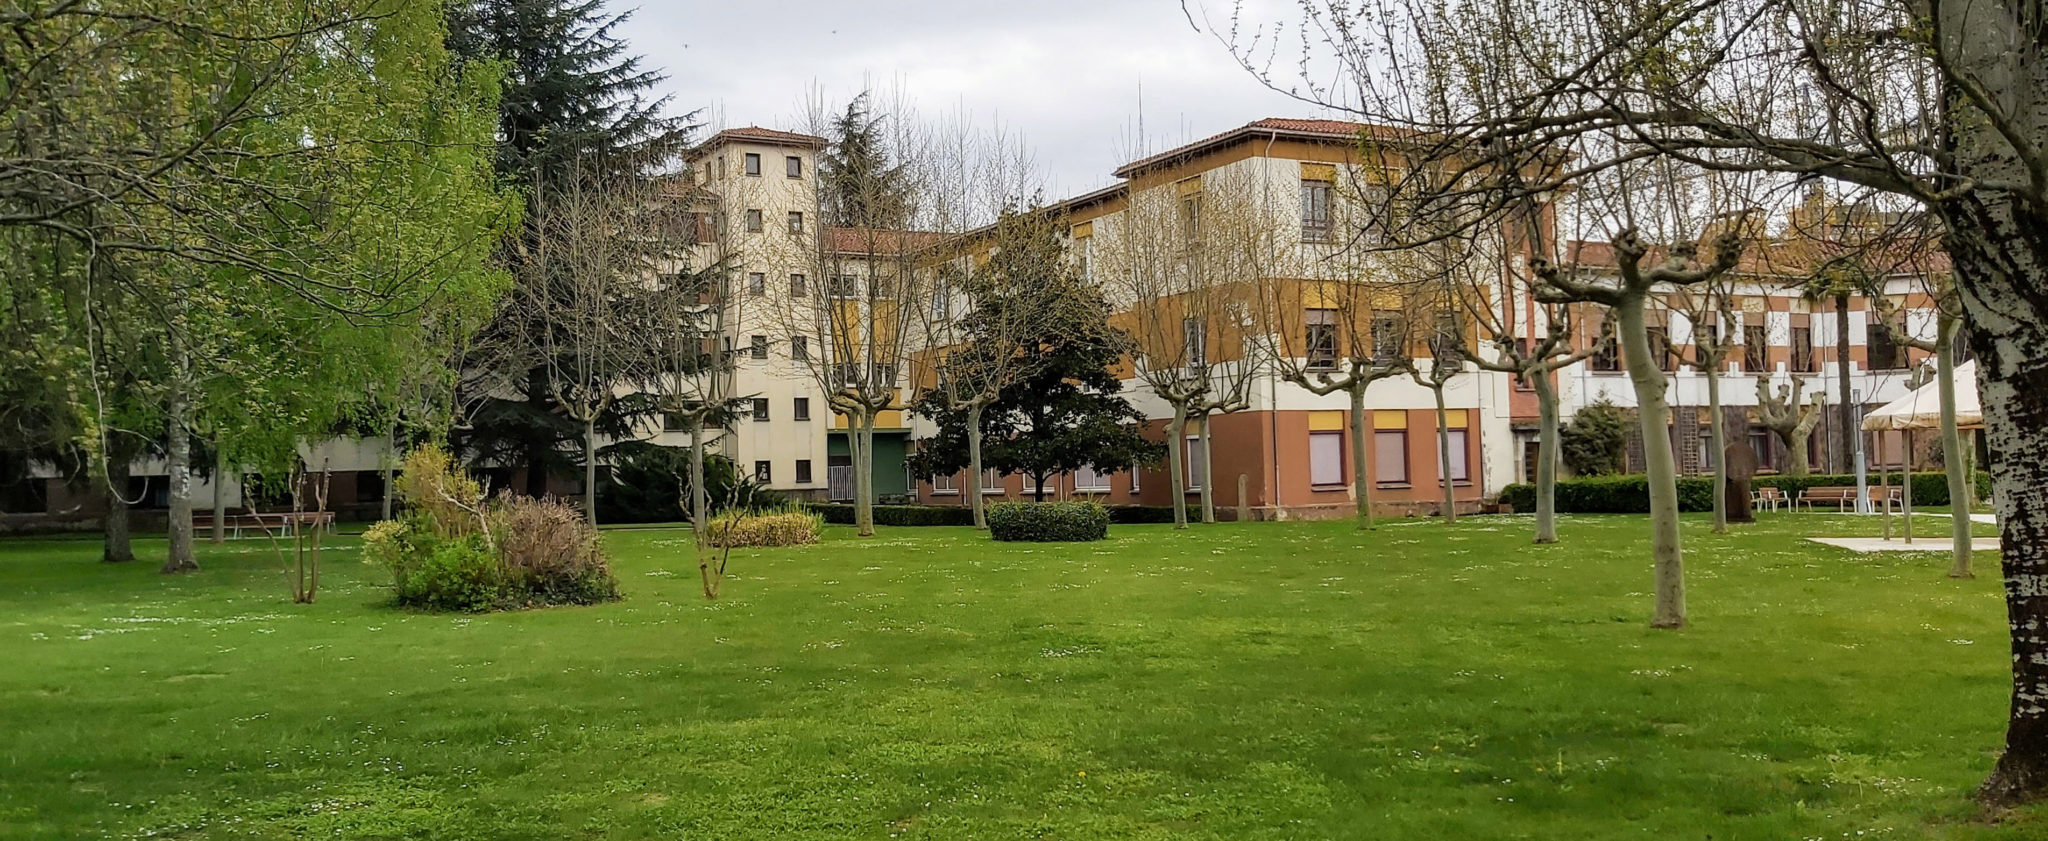 Jardines de la Casa de Misericordia de Pamplona